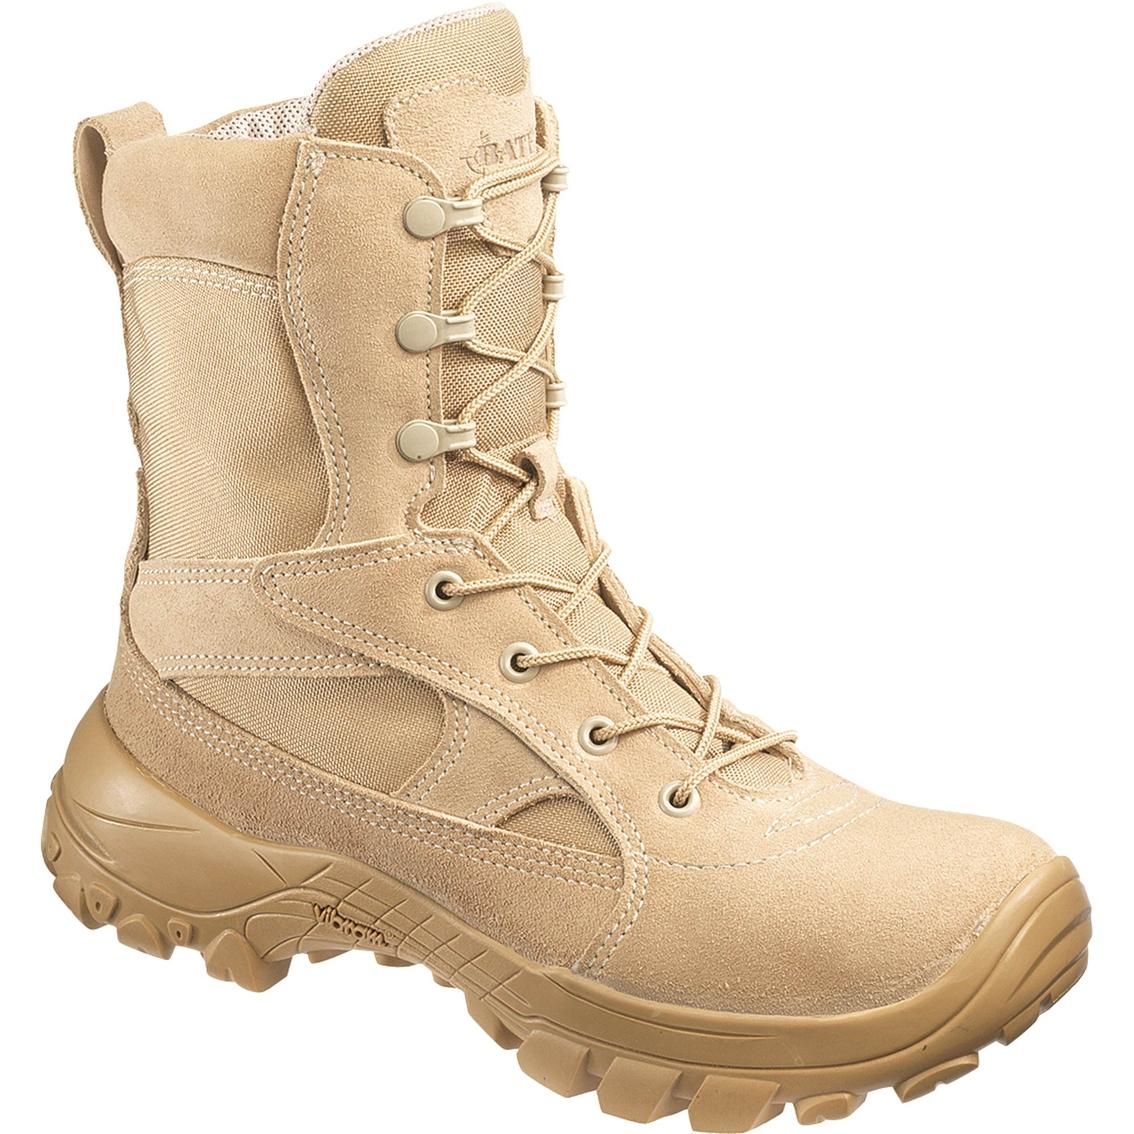 Bates Mens Army Delta 8 Desert Tan Combat Boots (1801) | Desert ...